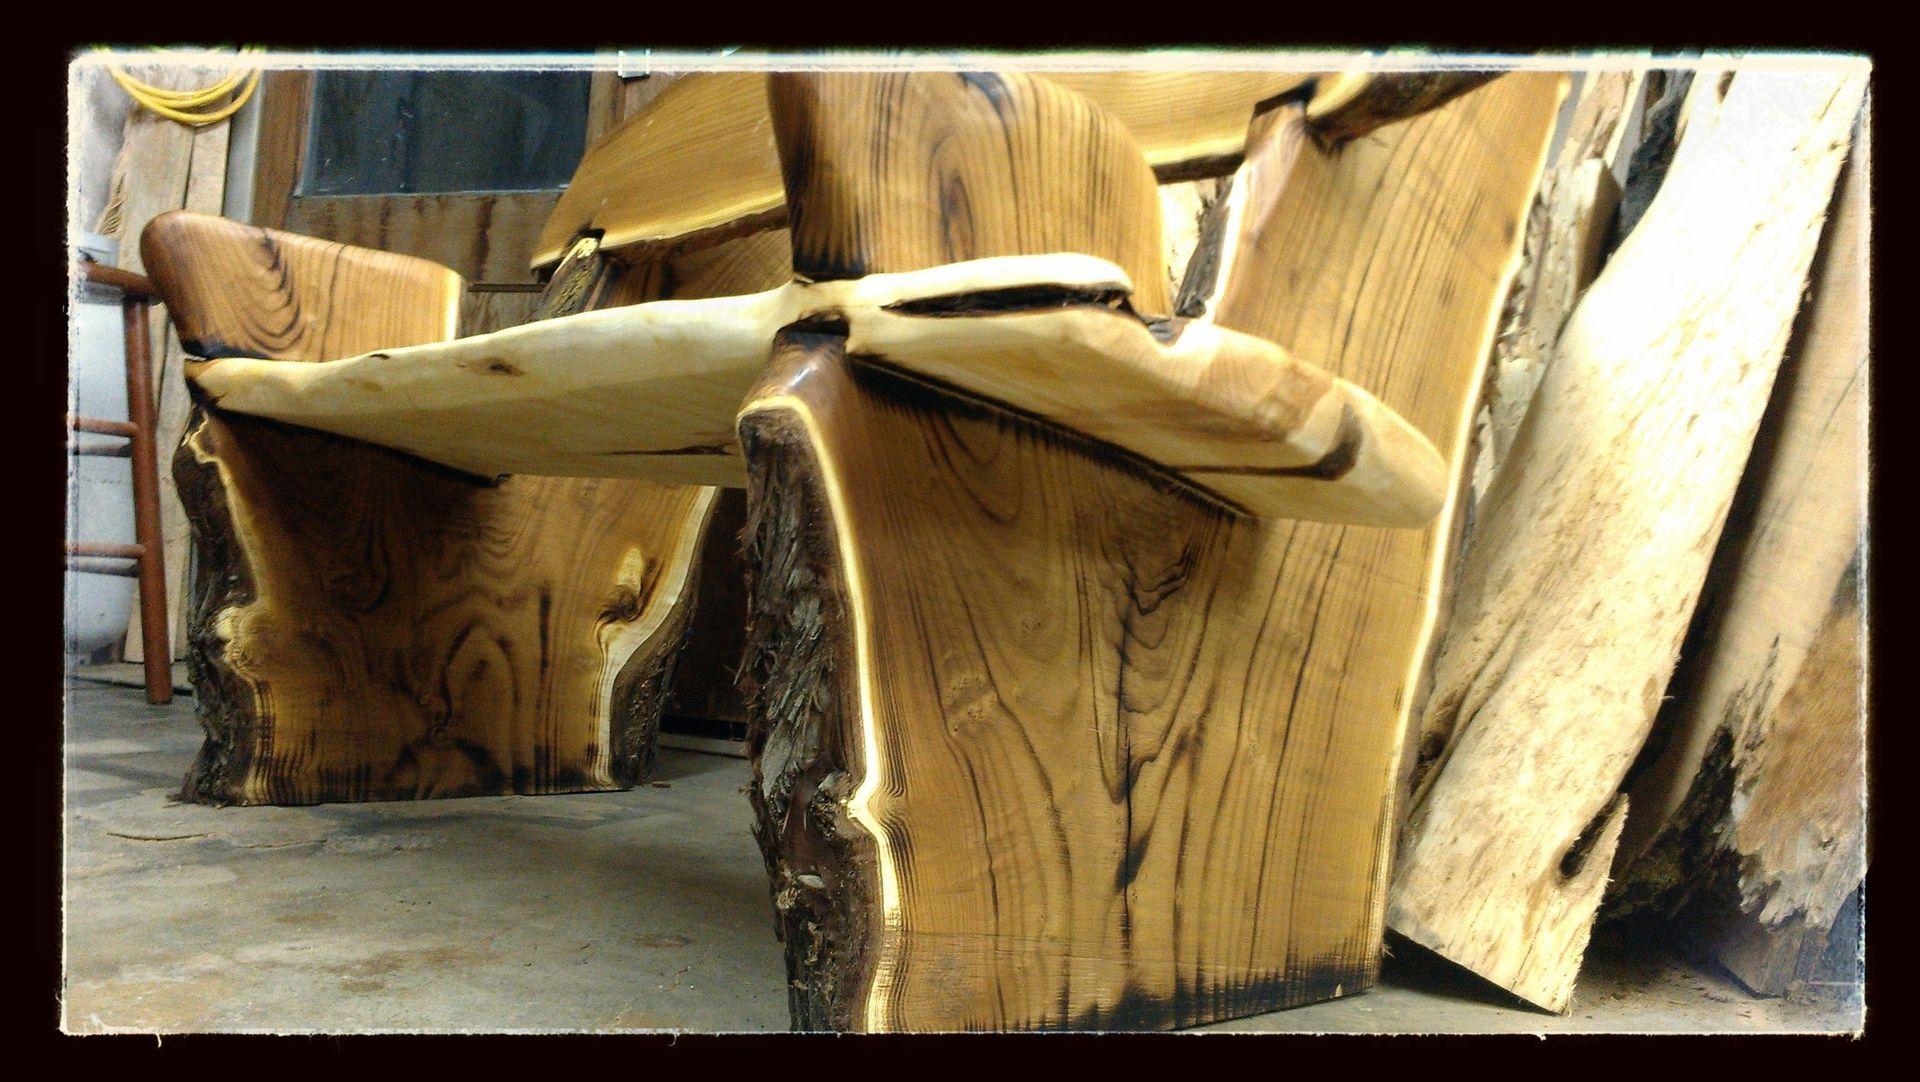 Log bench home made a rustic - Rustic Wood Slab Bench Recherche Google